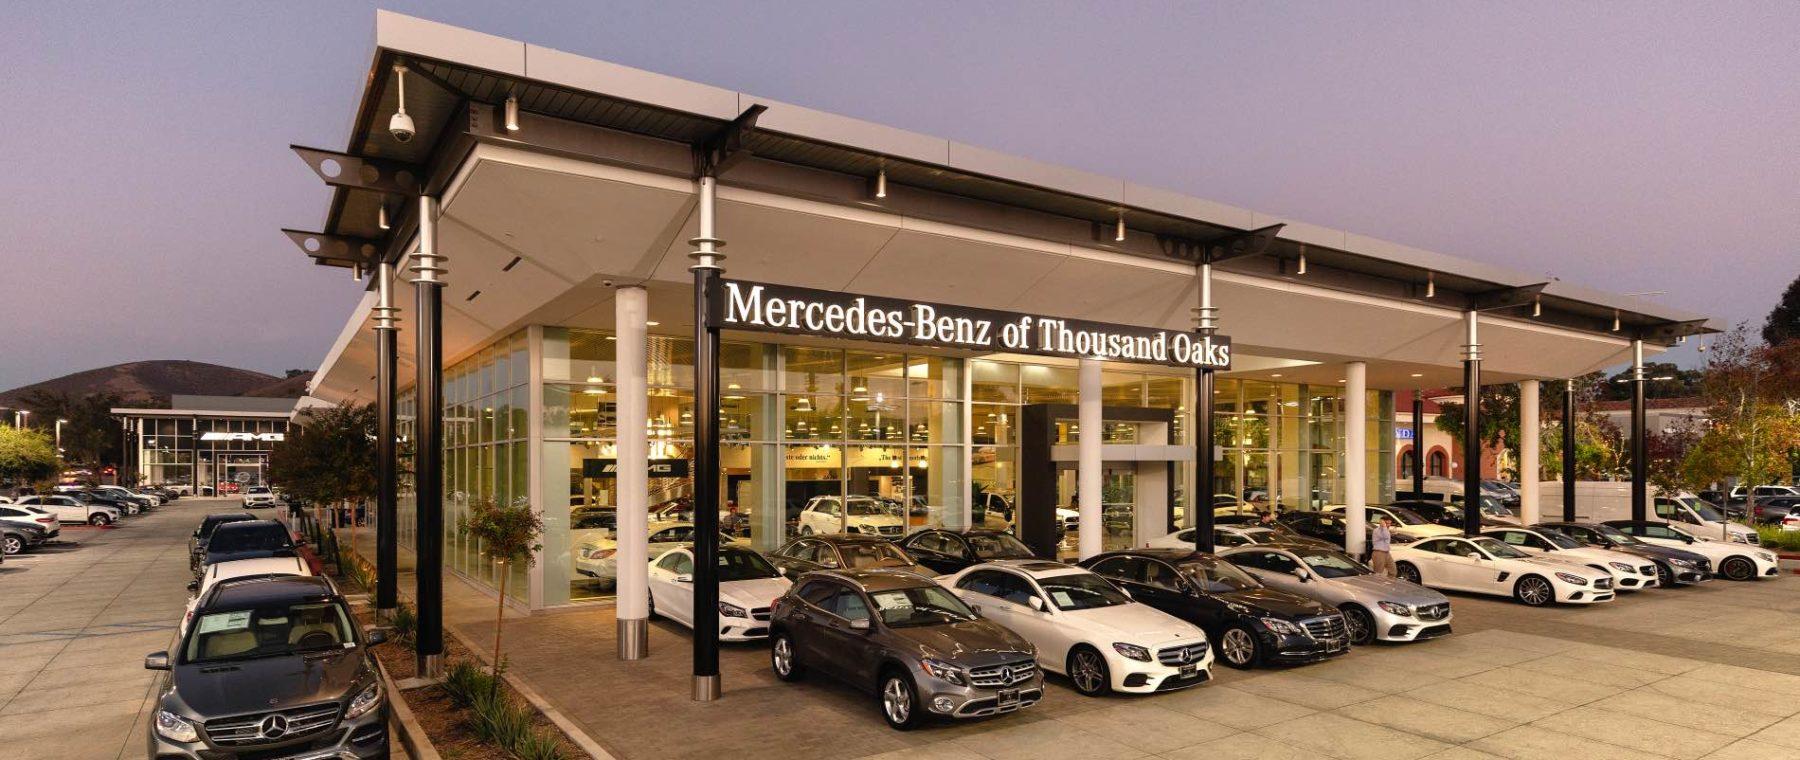 Mercedes Benz Dealership >> Mercedes Benz Of Thousand Oaks Mercedes Benz Dealer In